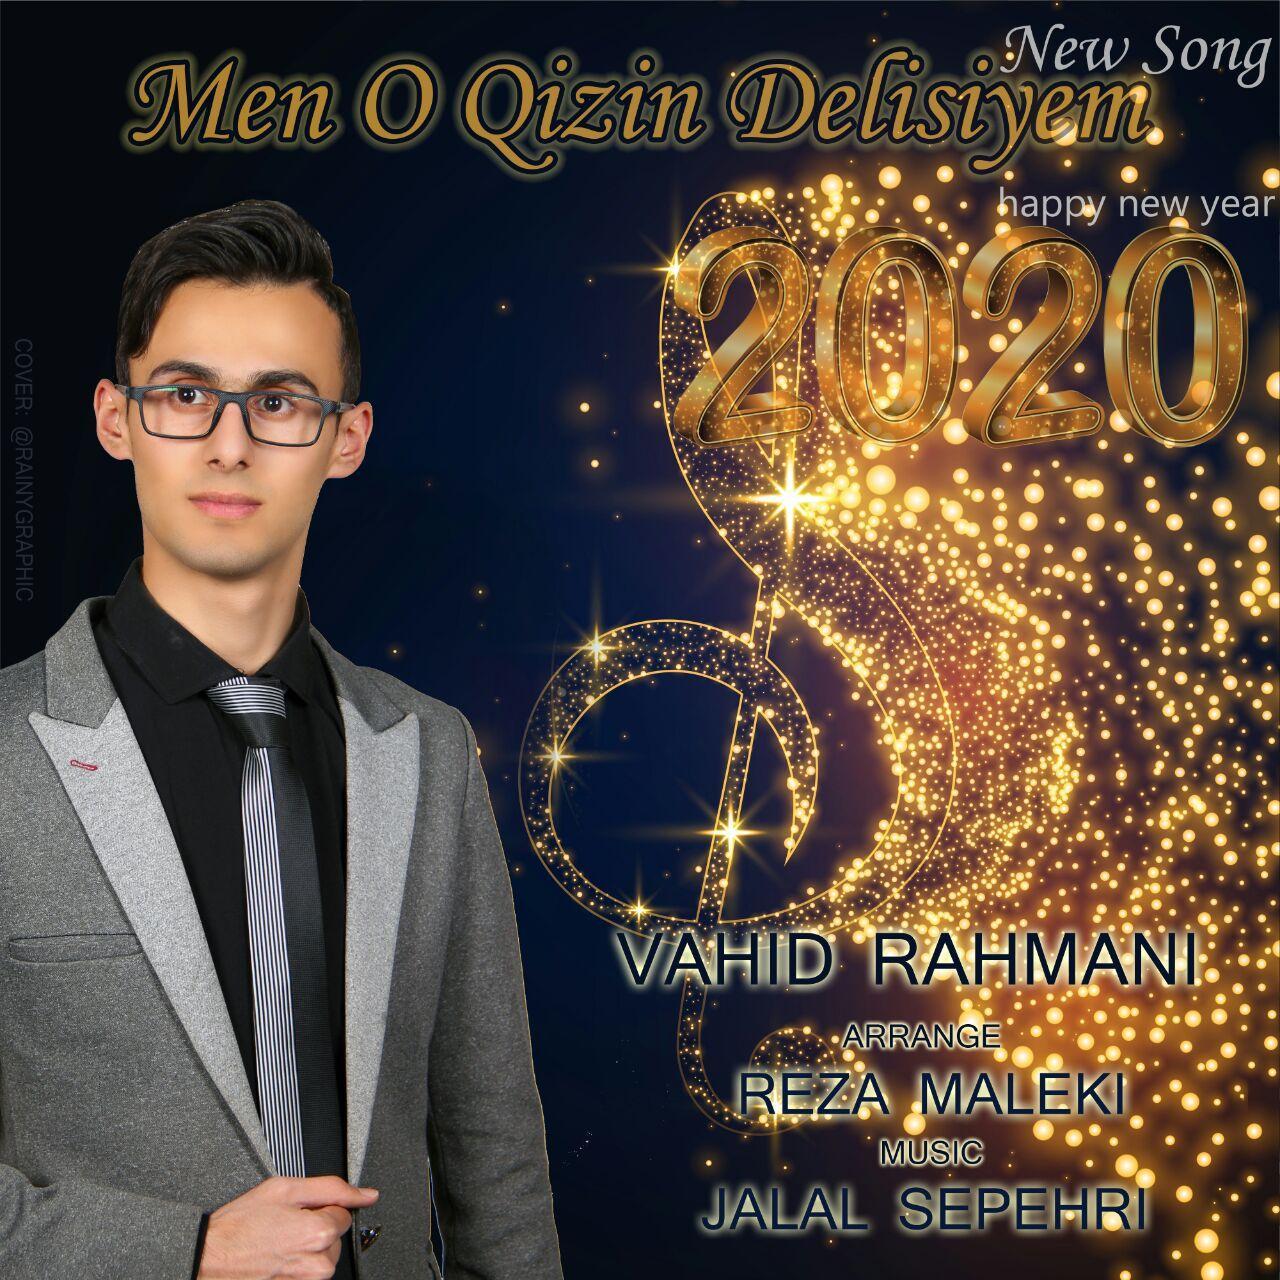 http://s6.picofile.com/file/8388852750/20Vahid_Rahmani_Men_O_Qizin_Delisiyem.jpg